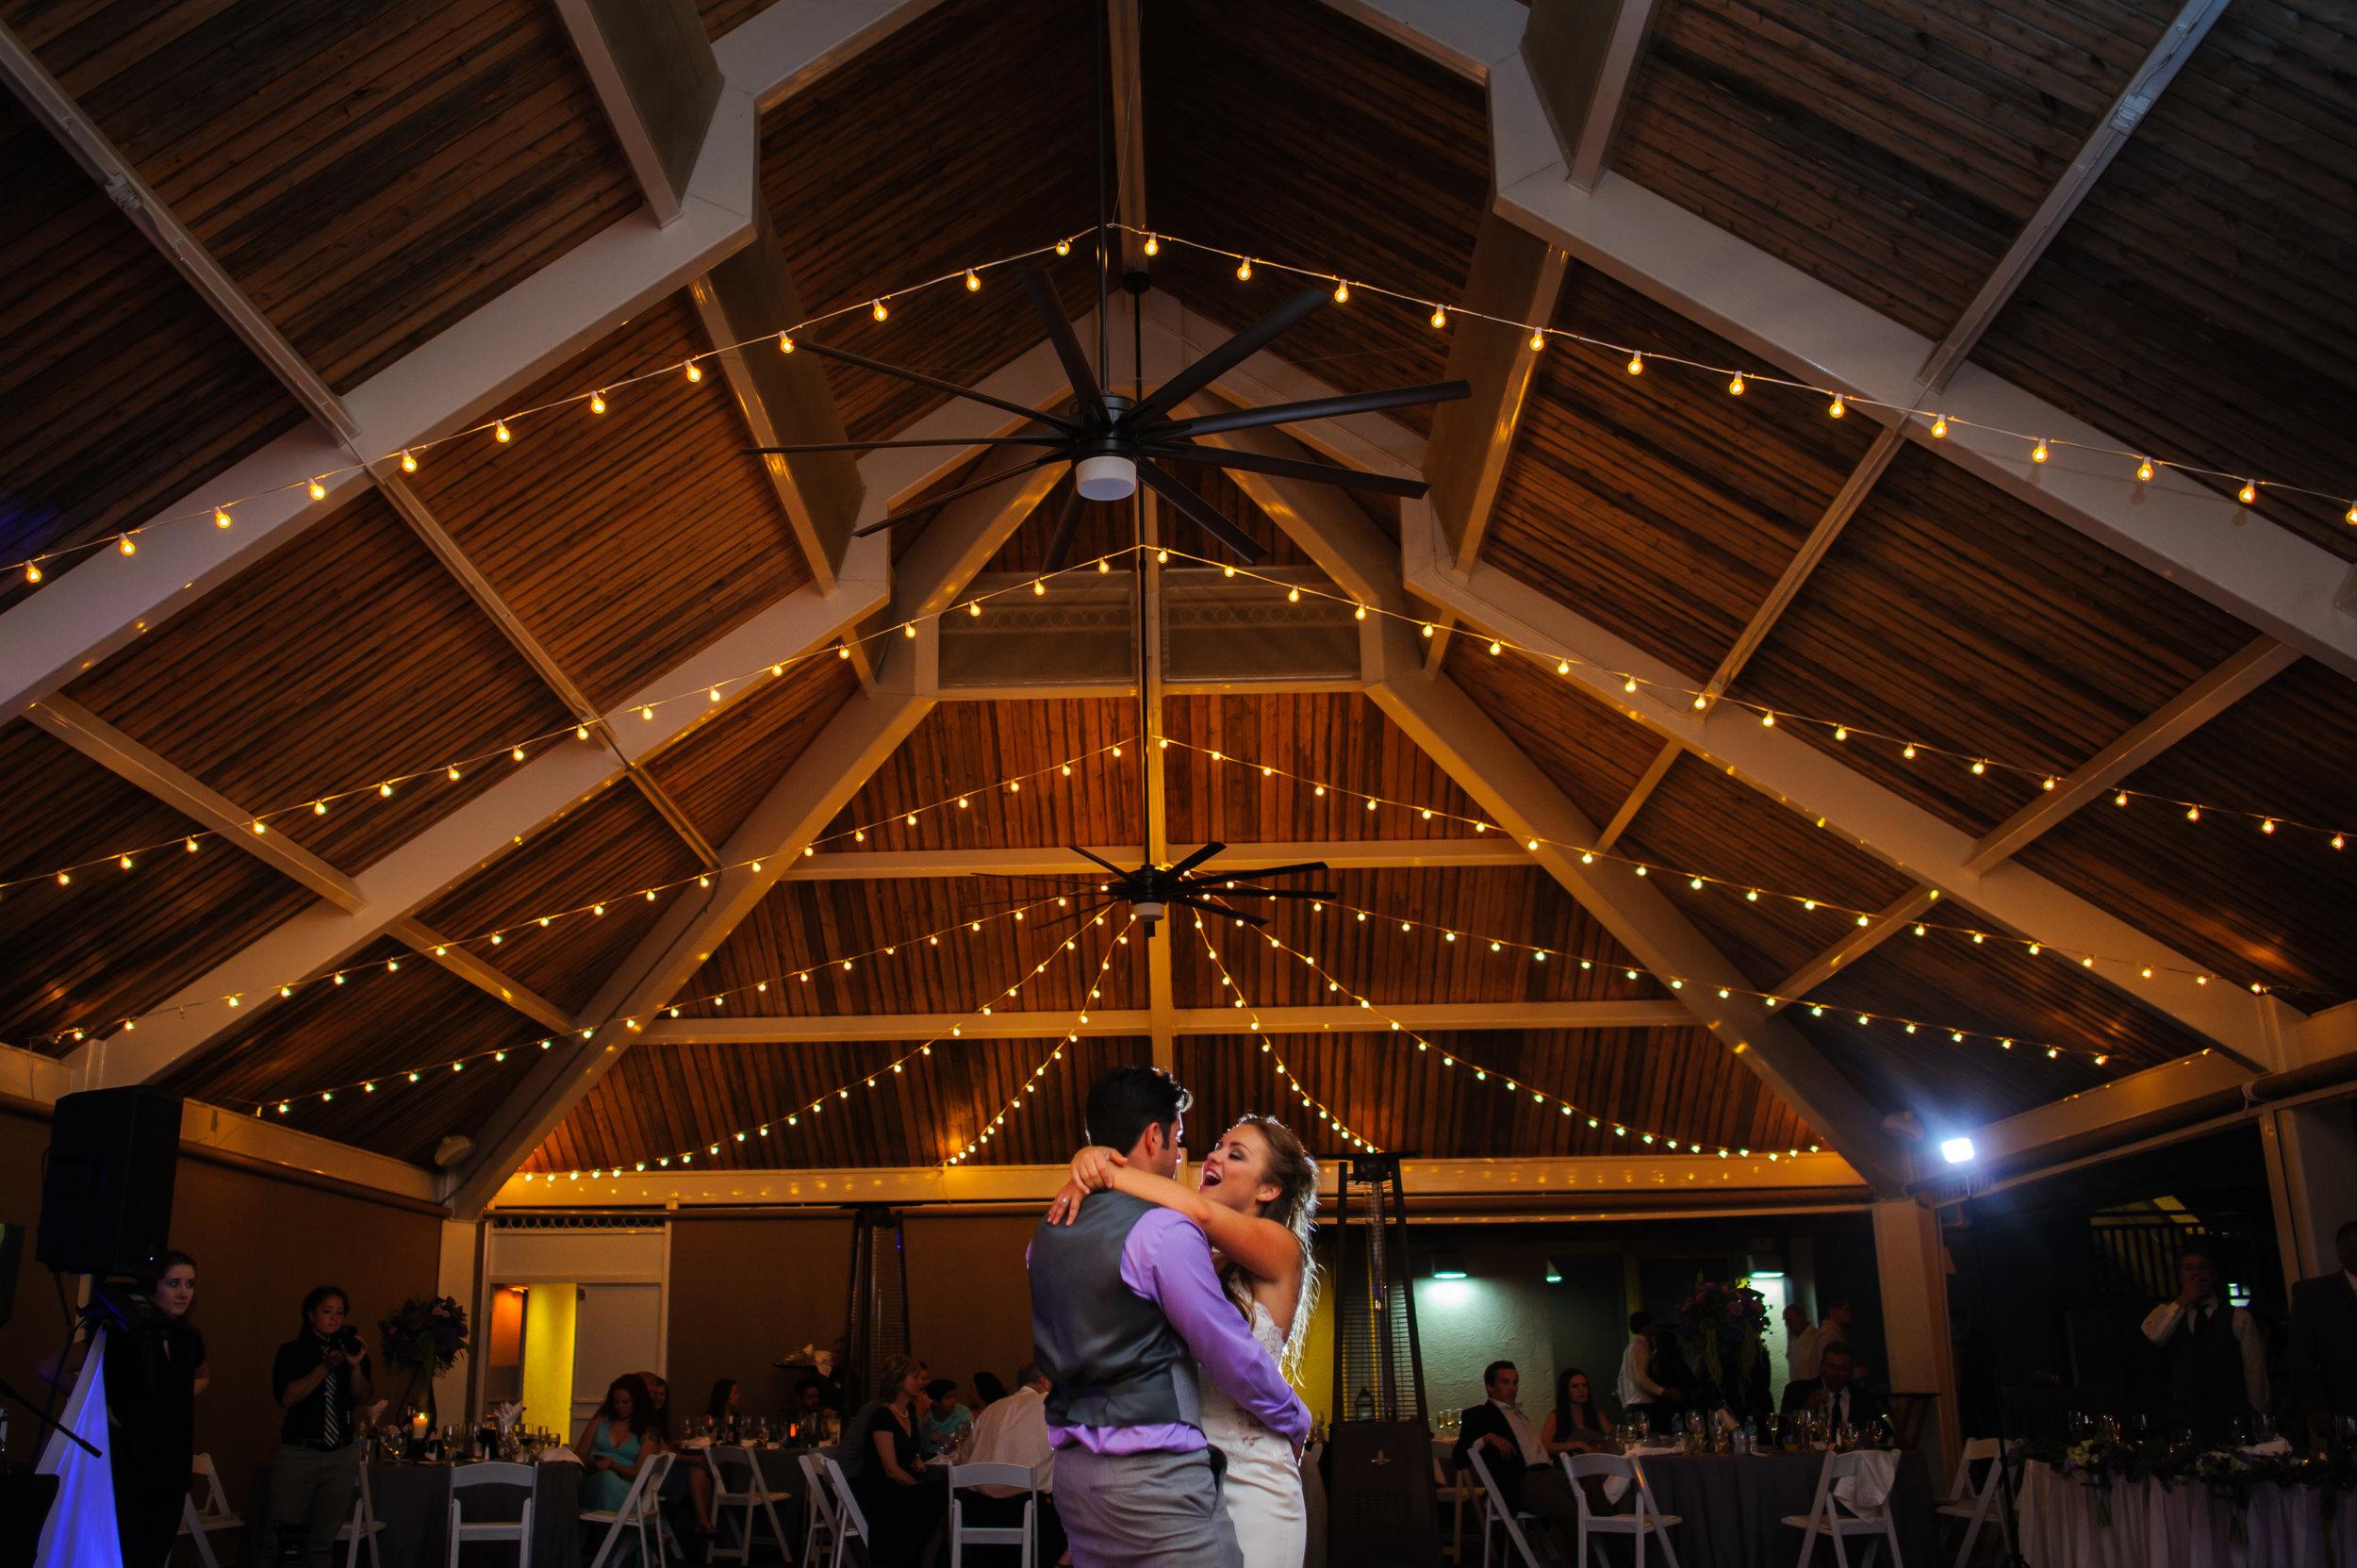 becca-jacob-042-tenaya-lodge-yosemite-wedding-photographer-katherine-nicole-photography.JPG